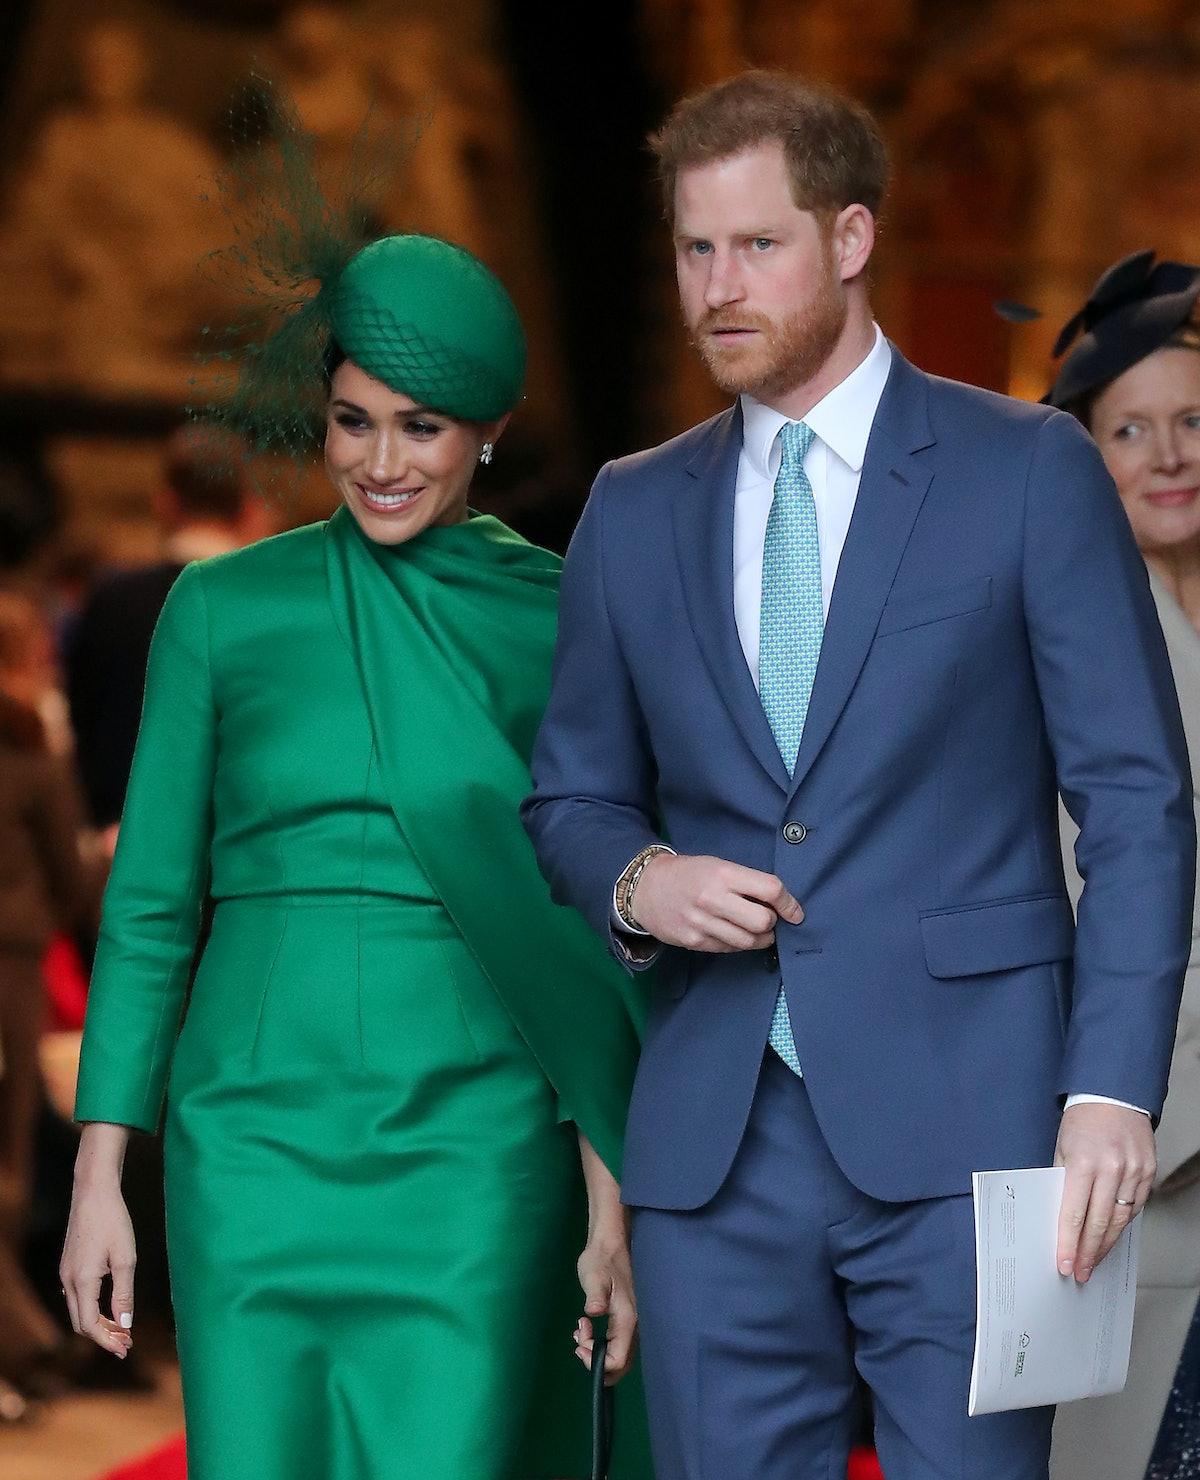 Meghan Markle and Prince Harry make a public appearance.